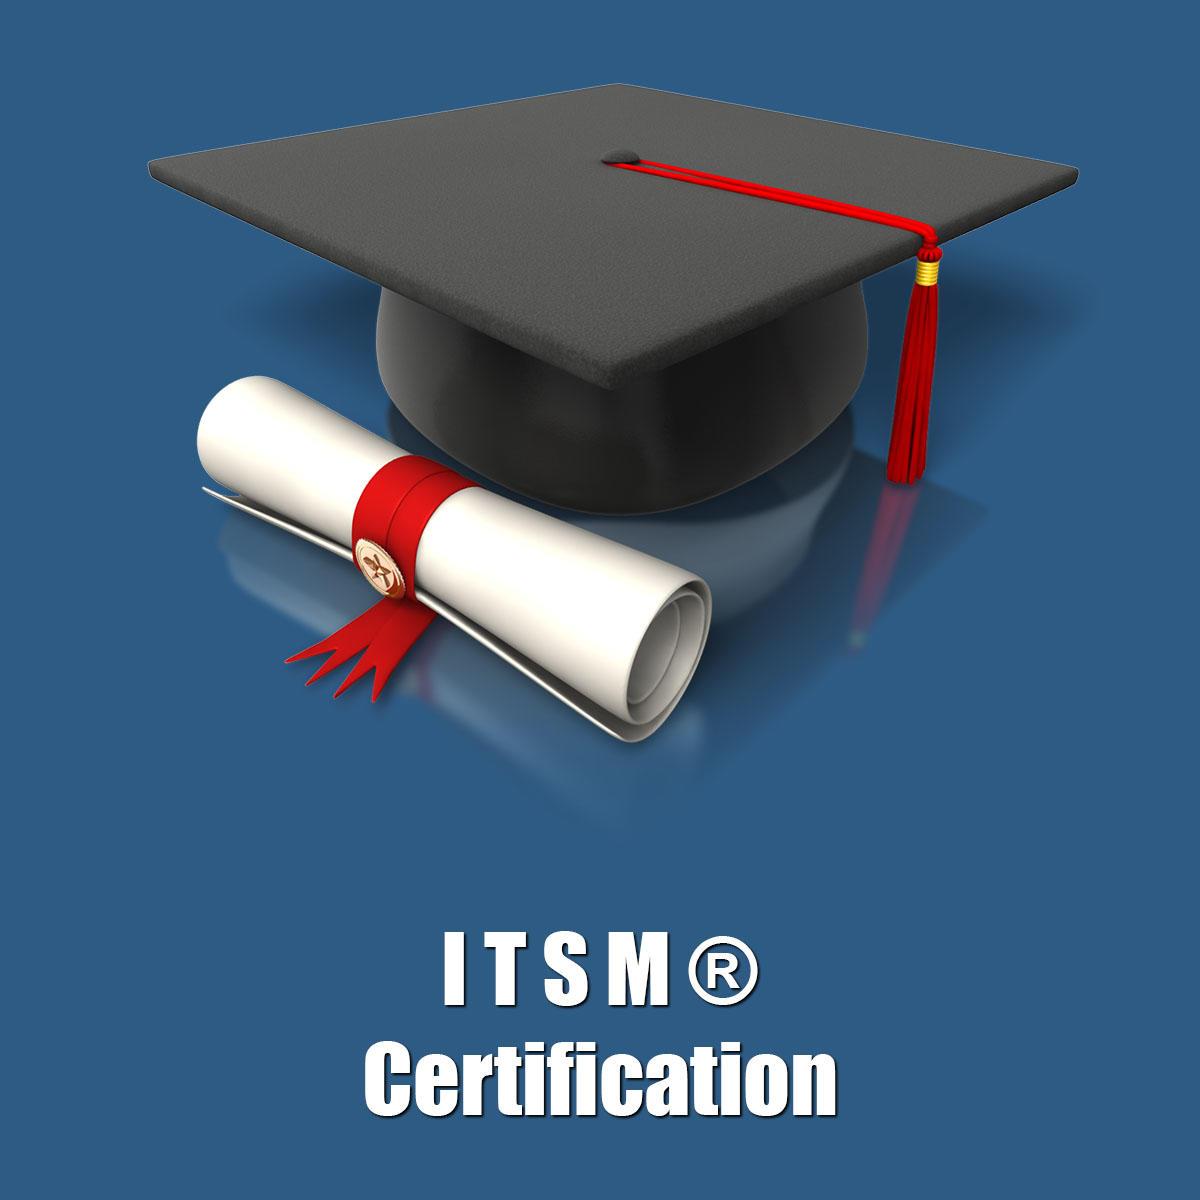 Itsm Certification 30 Days Management Square